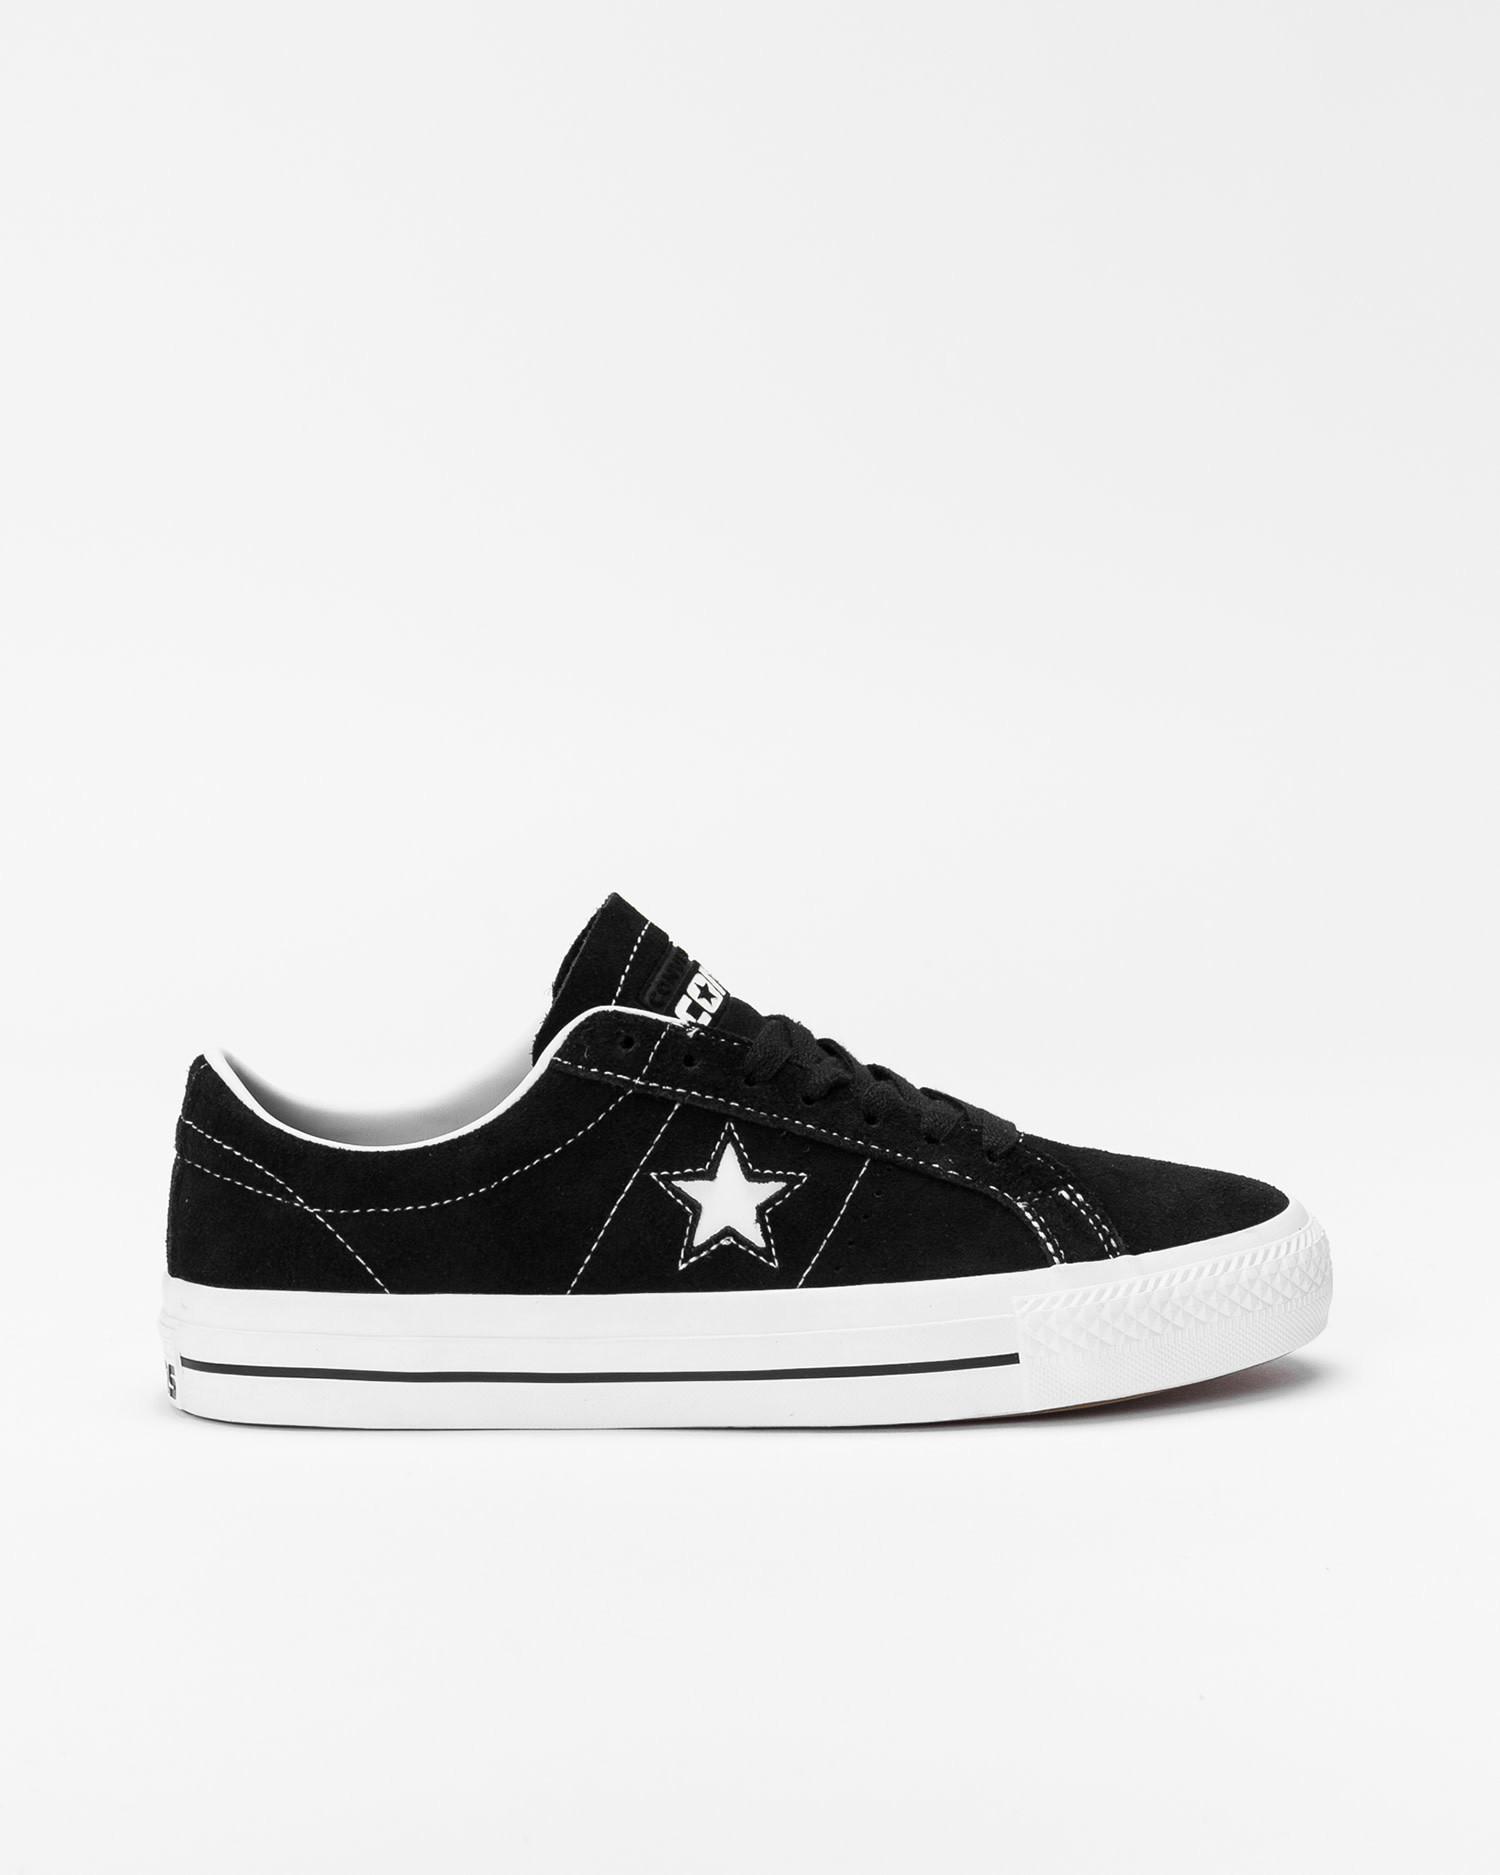 Converse Pro One Star Ox Black/White/White Black